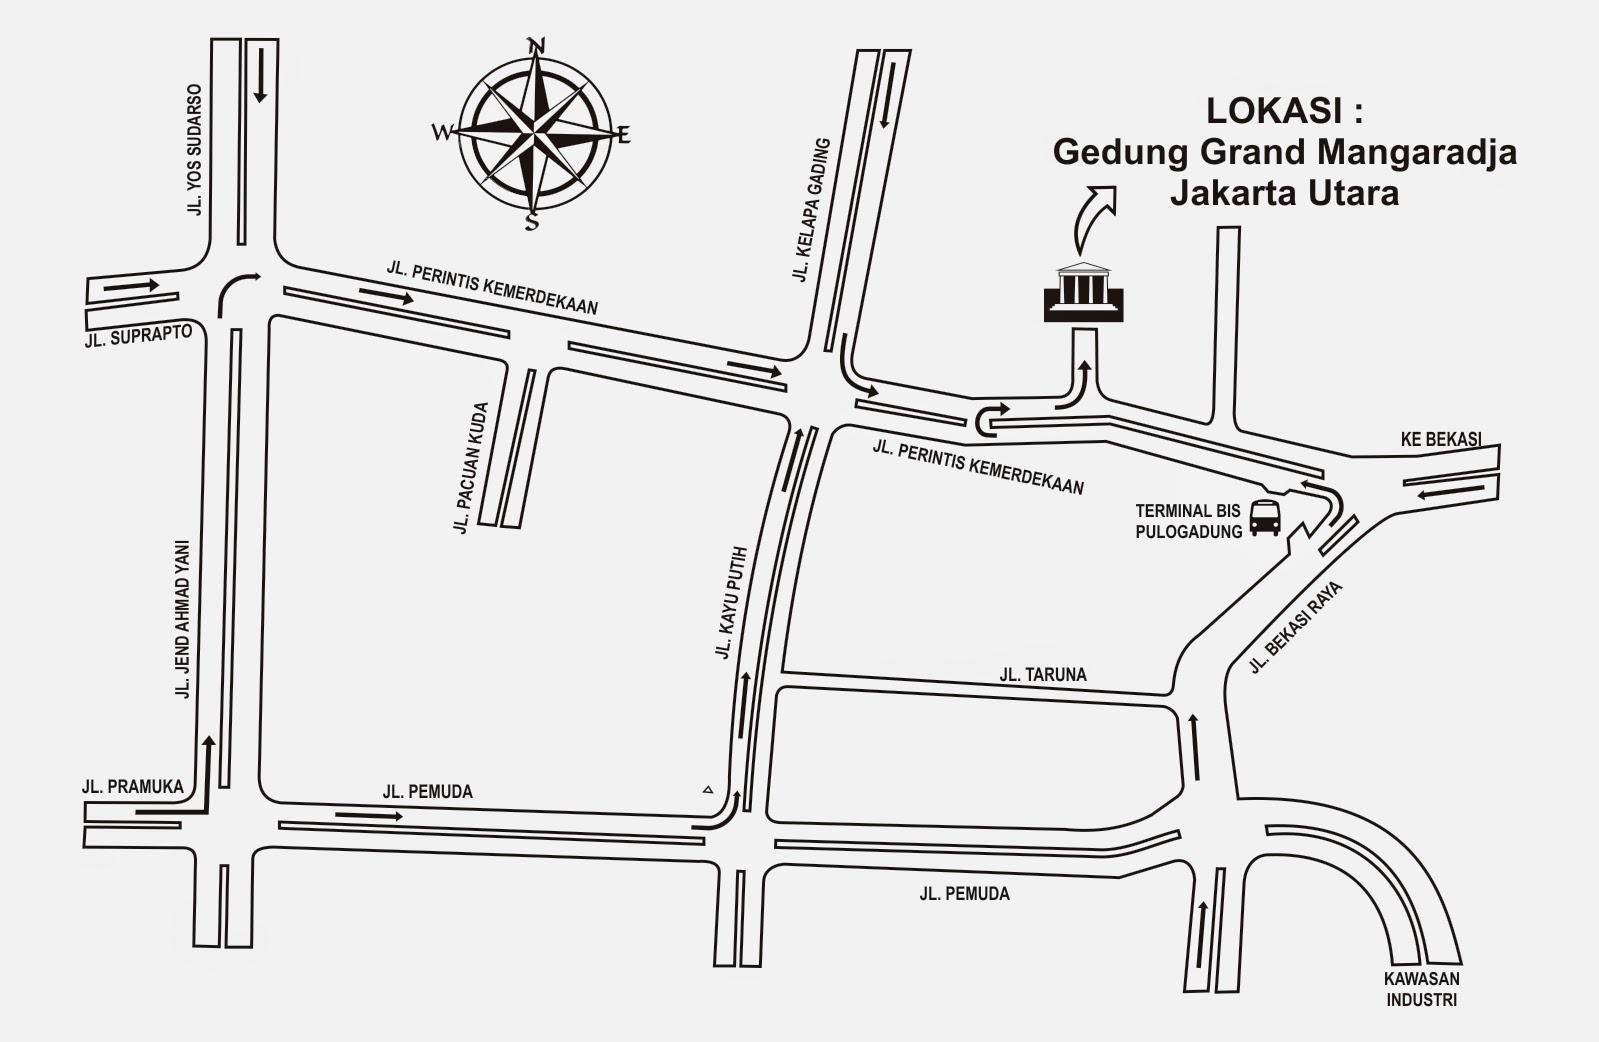 Denah Gedung Grand Mangaradja Jakarta Utara